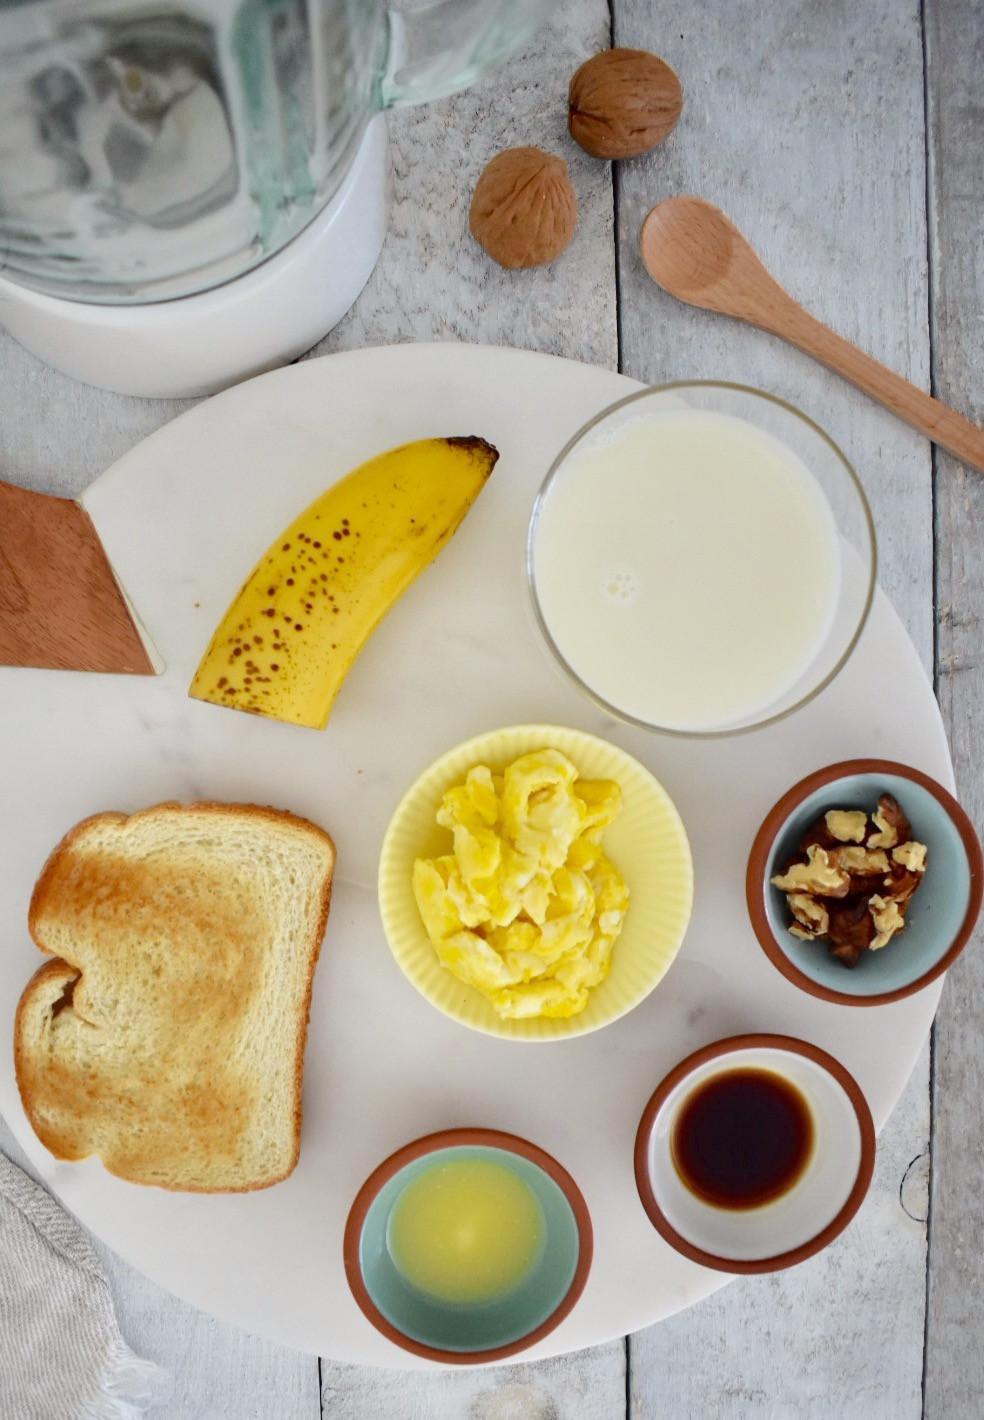 high protein blenderized tube feeding recipe ingredients.